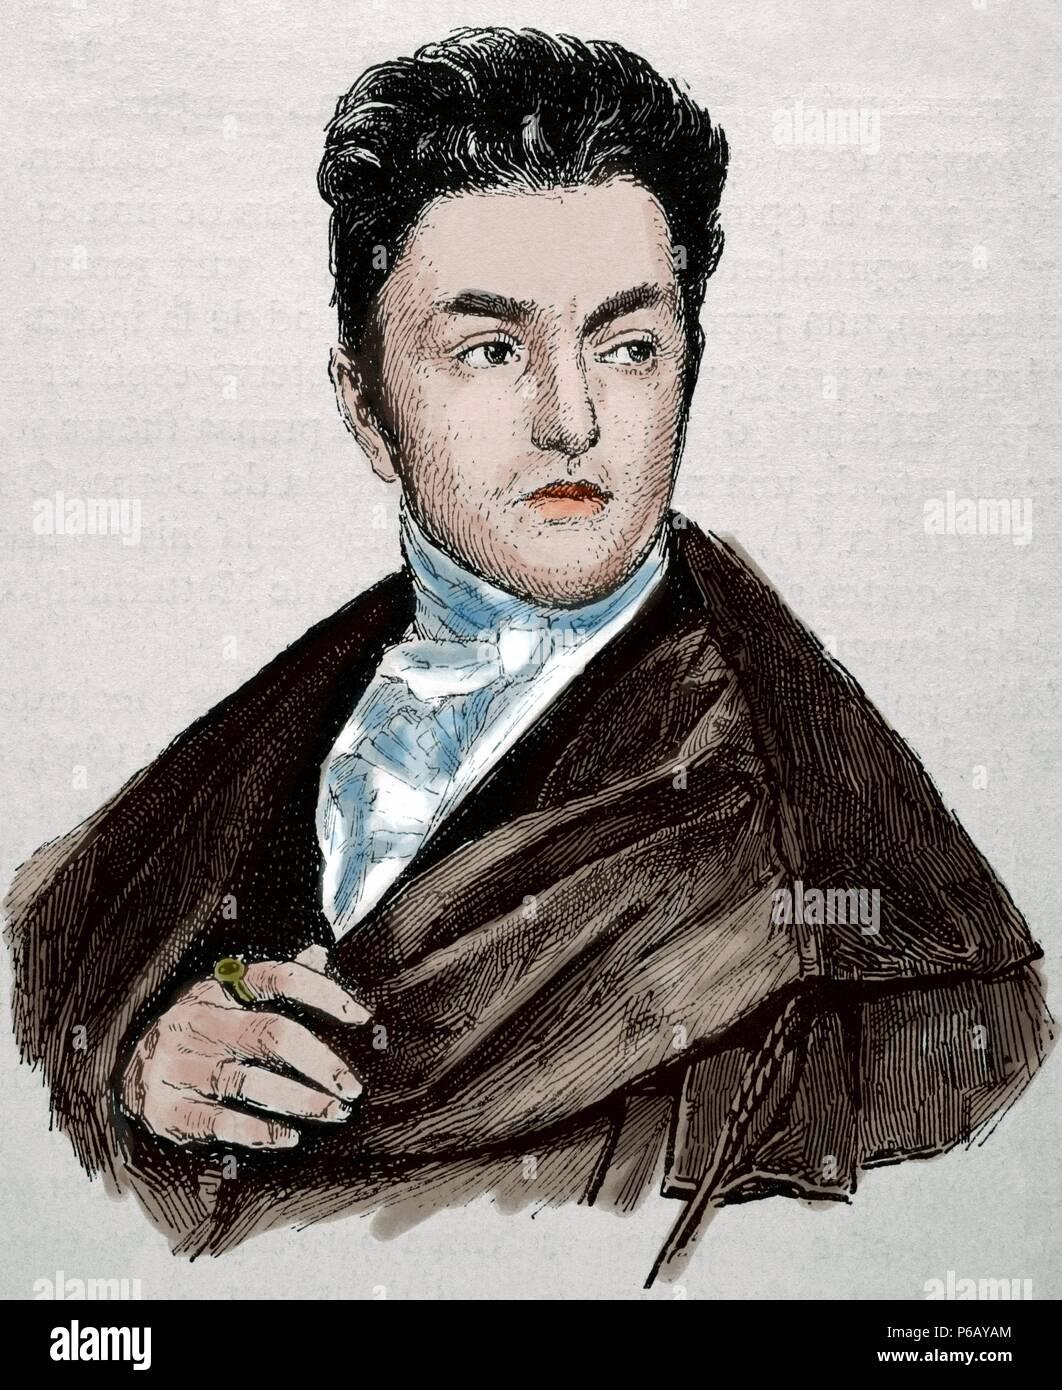 Maximilian Emanuel von Lerchenfeld (1778-1843). Germany. Engraving by Historia Universal, 1883. Colored. - Stock Image